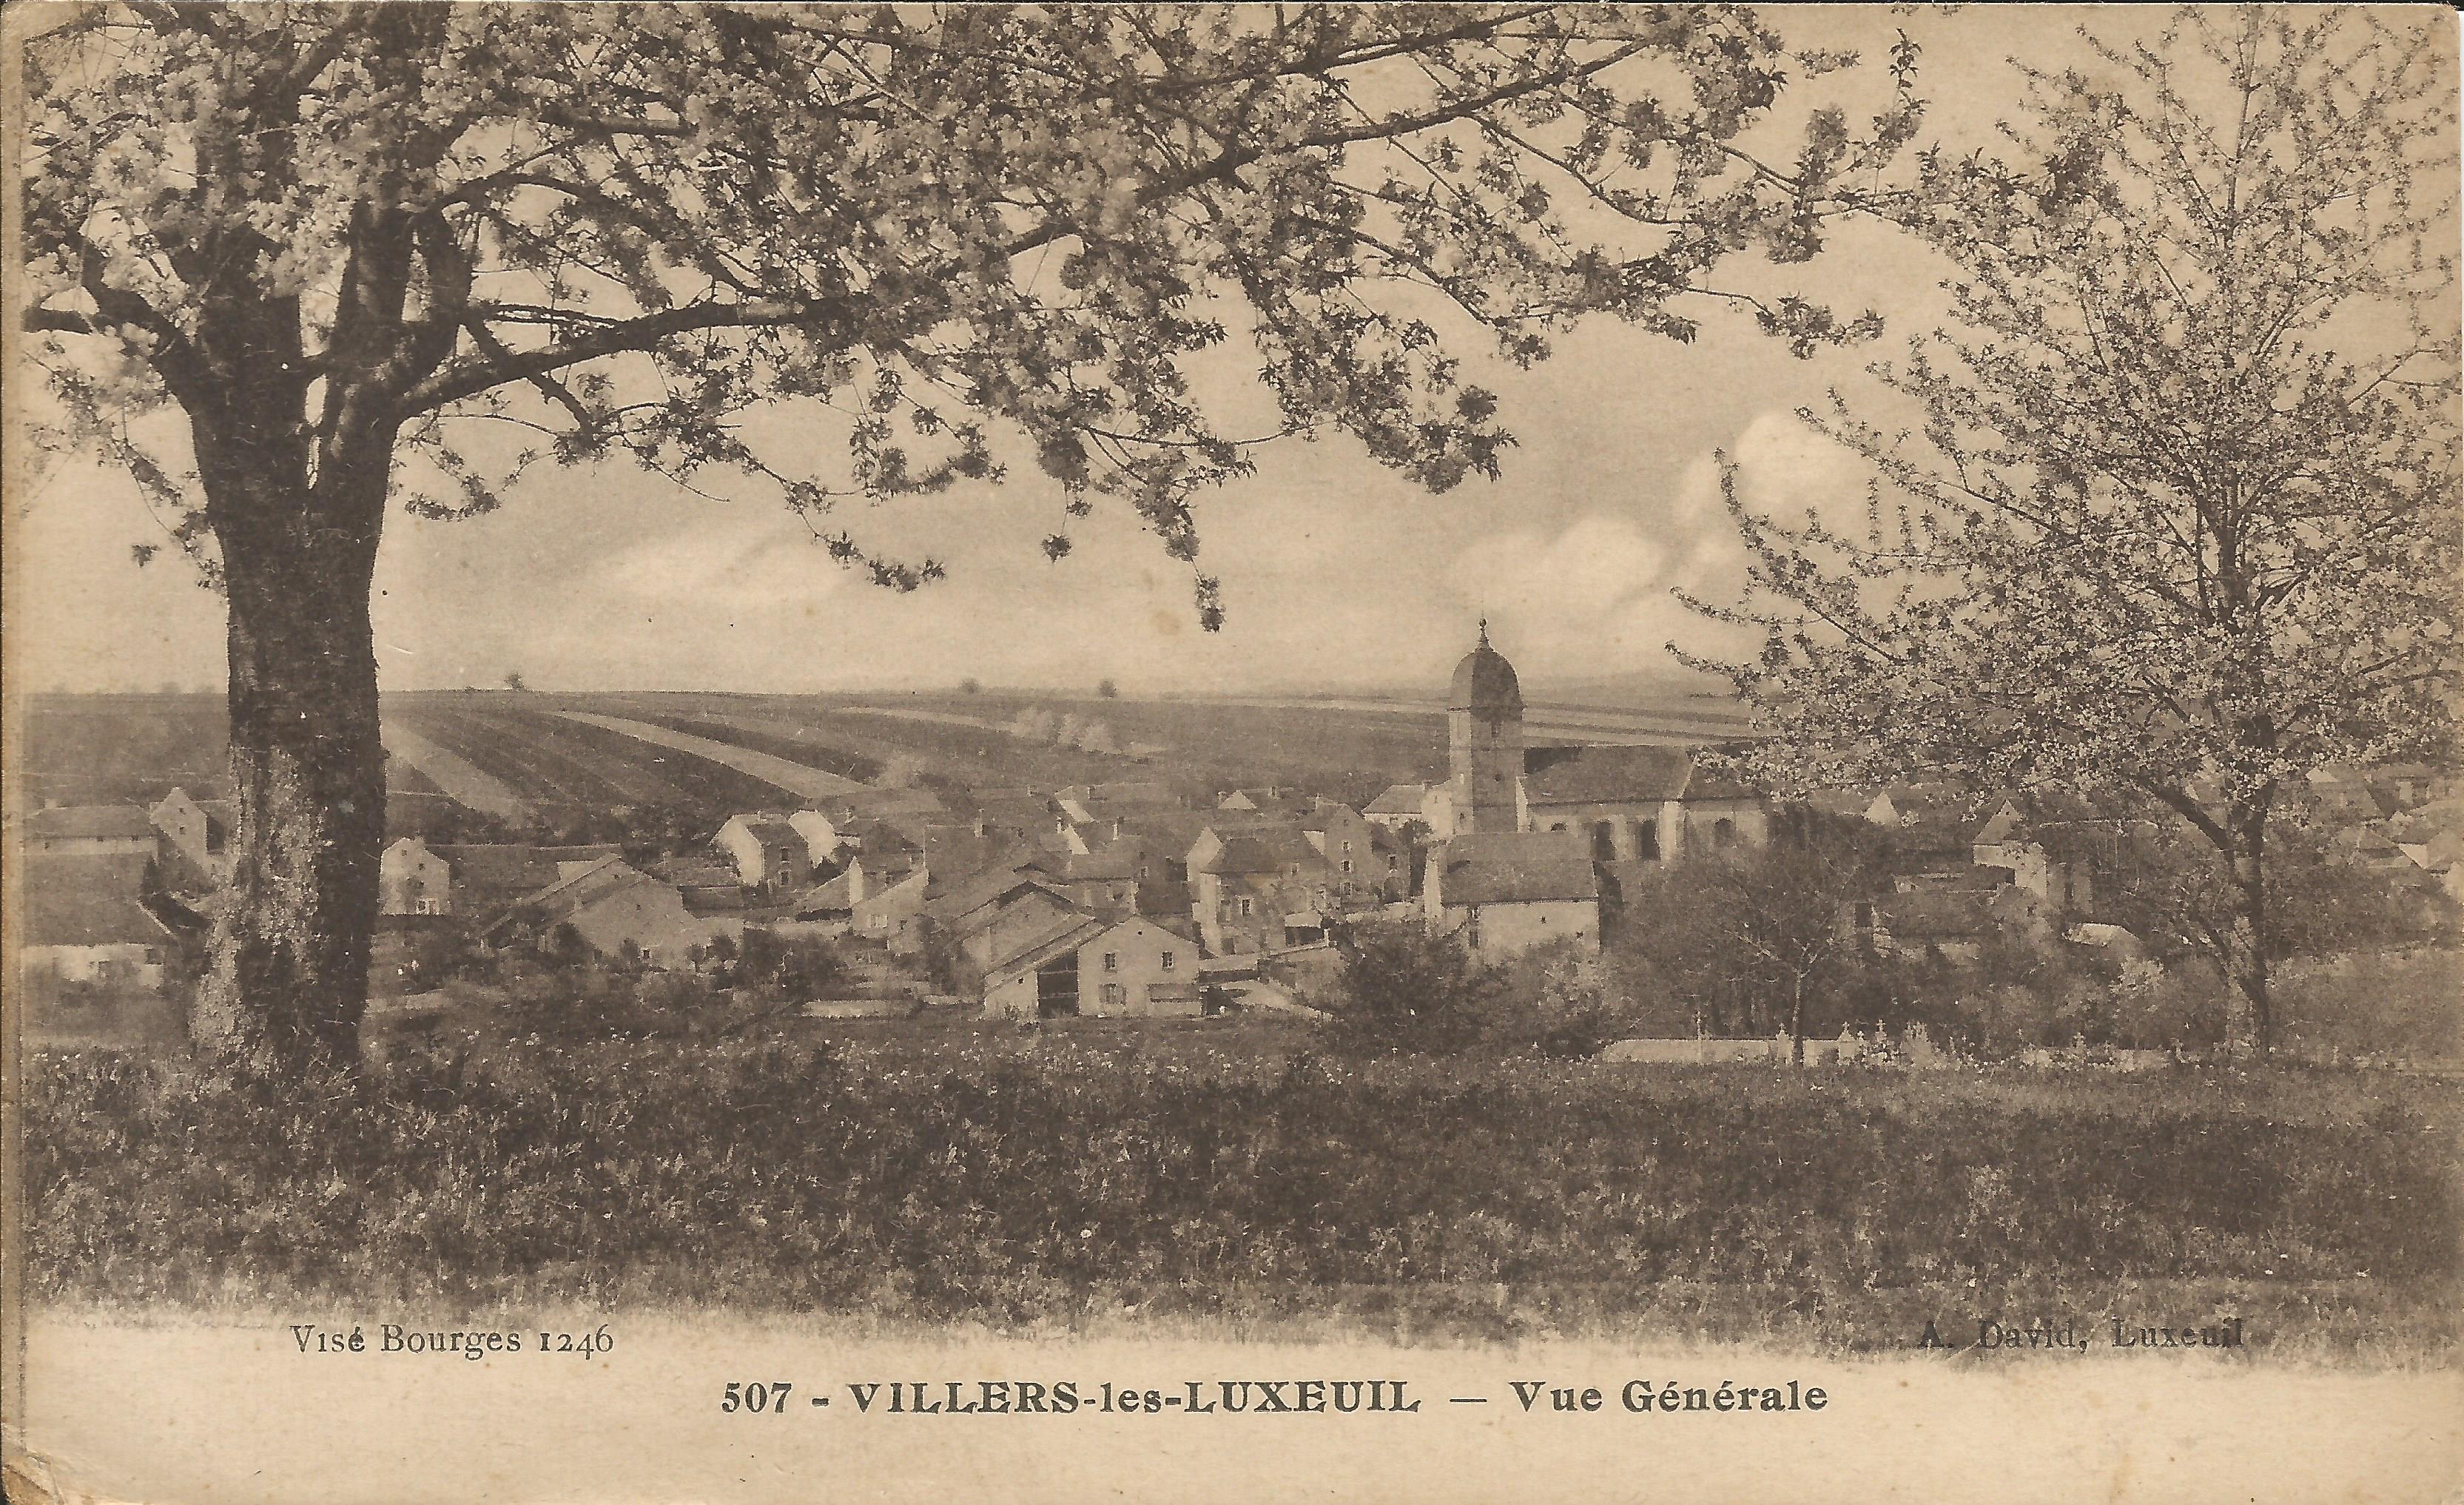 https://www.villers-les-luxeuil.com/projets/villers/files/images/Cartes_postales/General_2015/Vue_Generale_10_1919.jpg